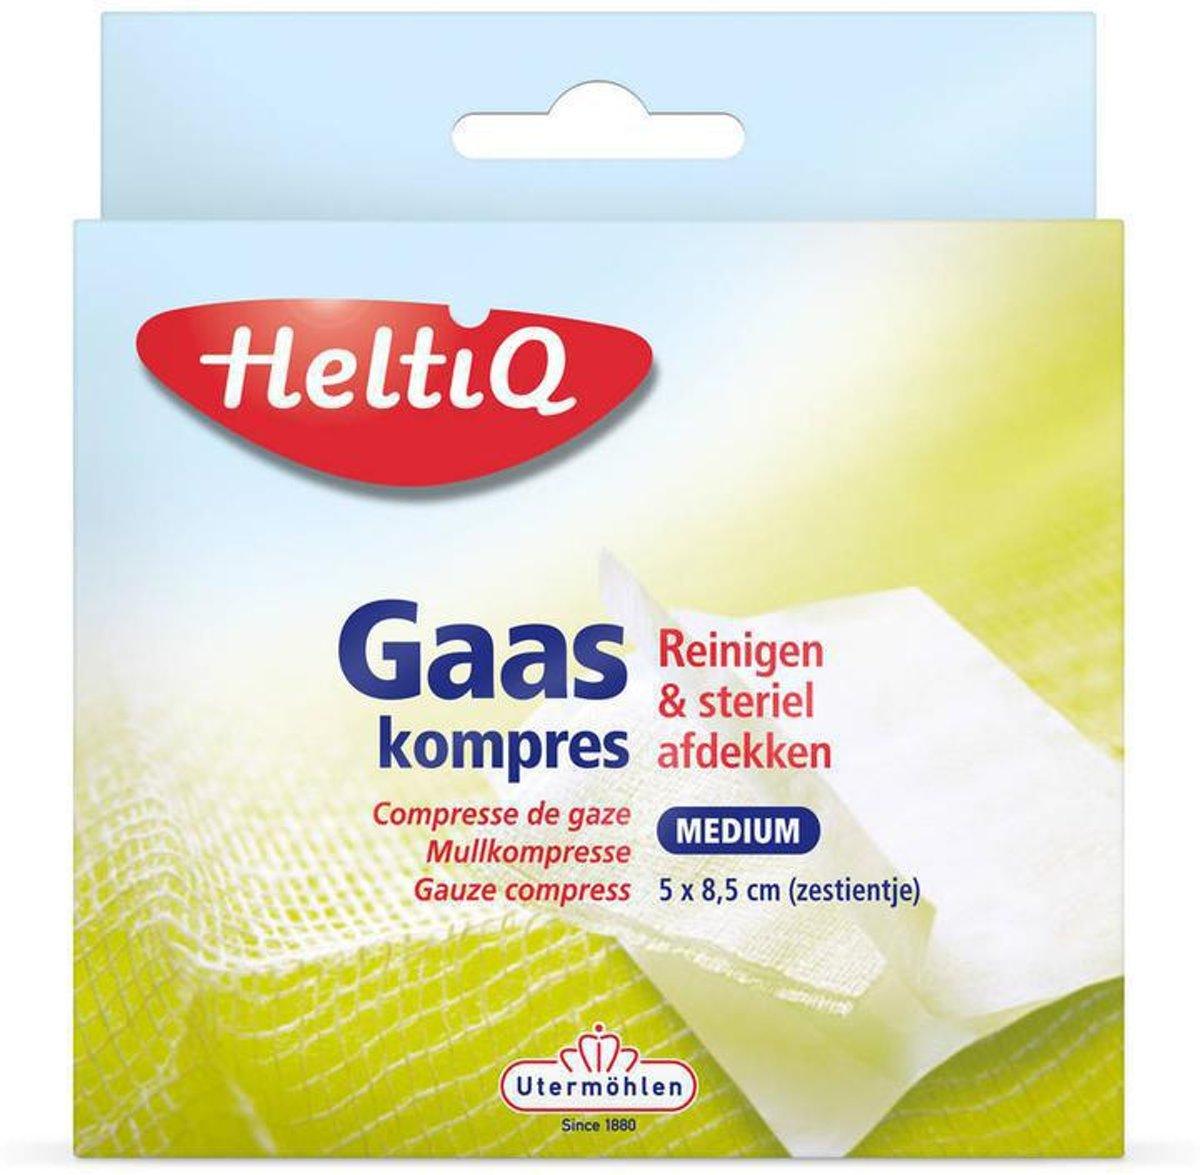 Heltiq Gaaskompres Medium Zestientje 16 Komp,